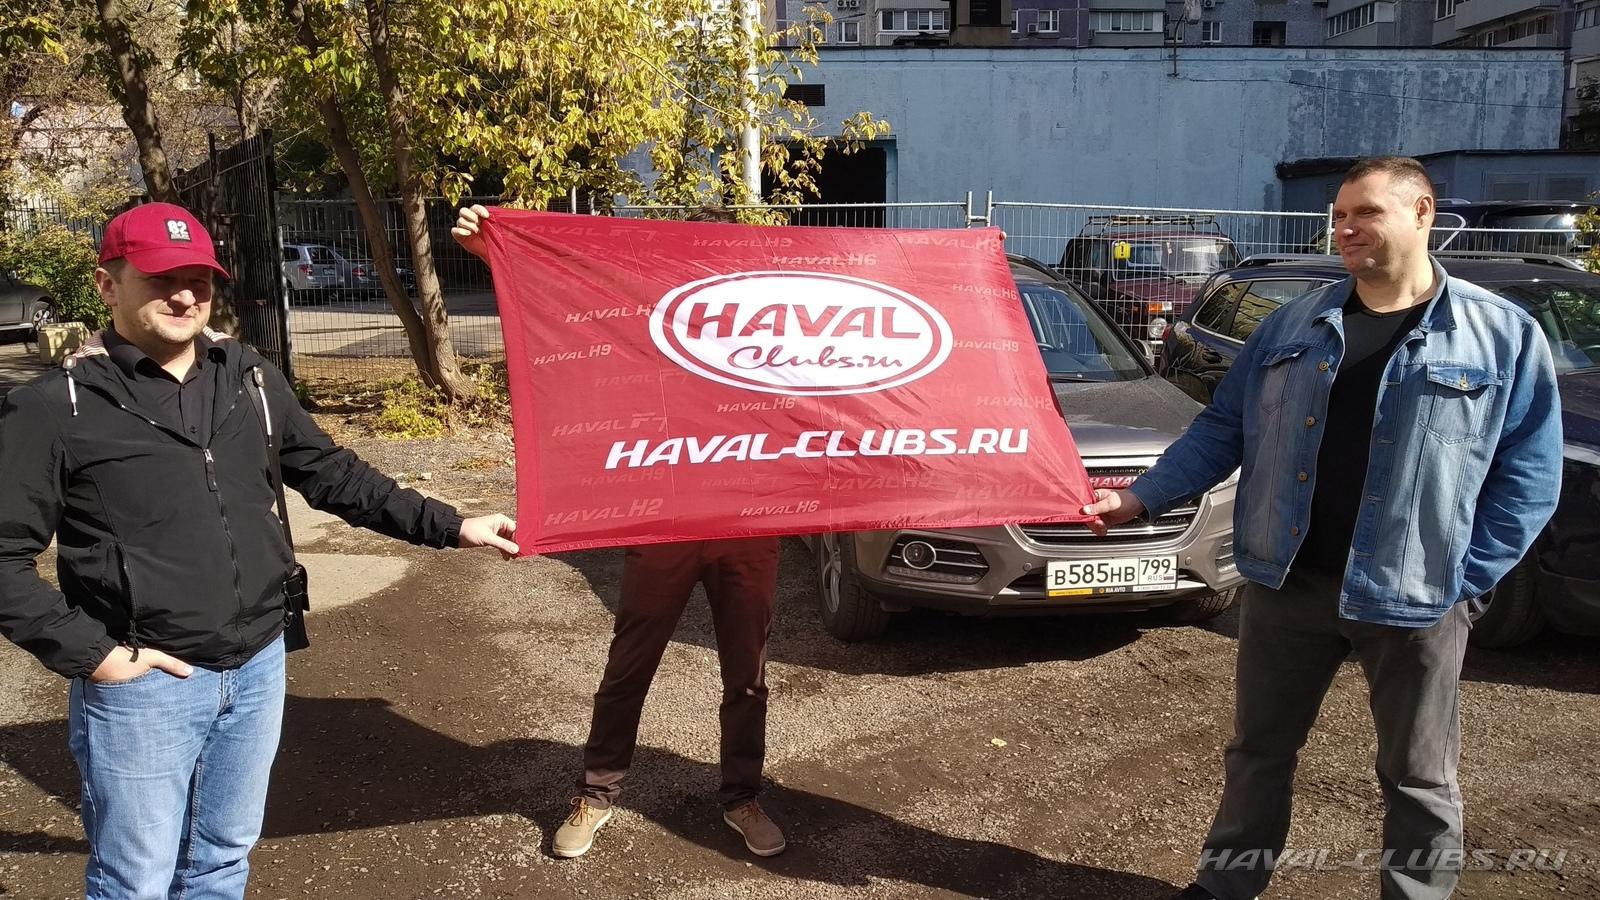 Haval Club / Хавал Клуб